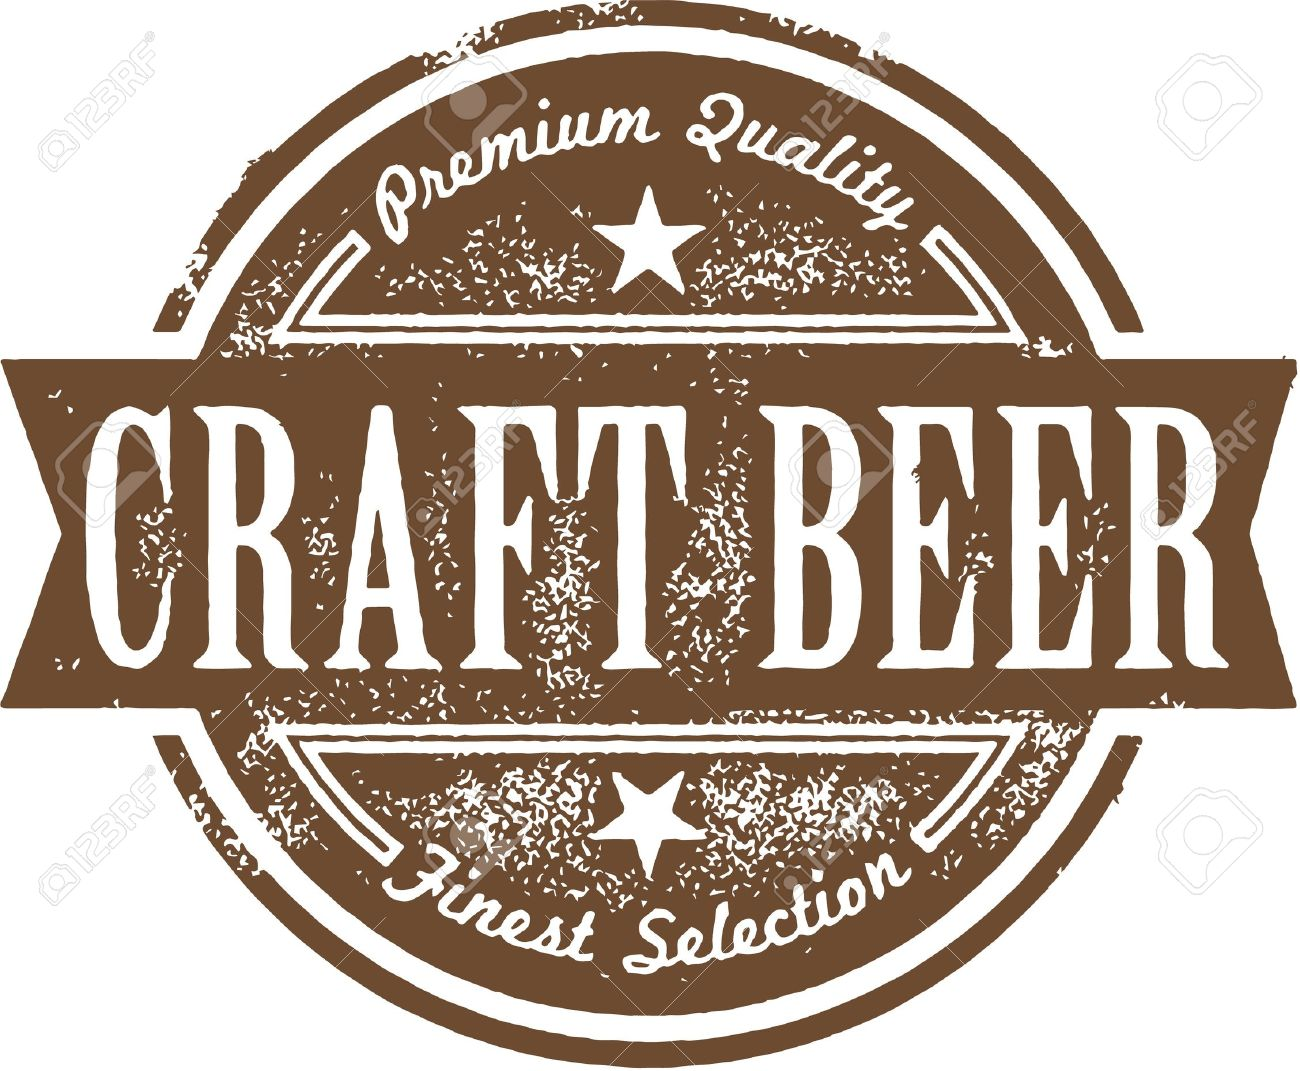 Craft Brewery Labels Craft Beer Label Beer Logo